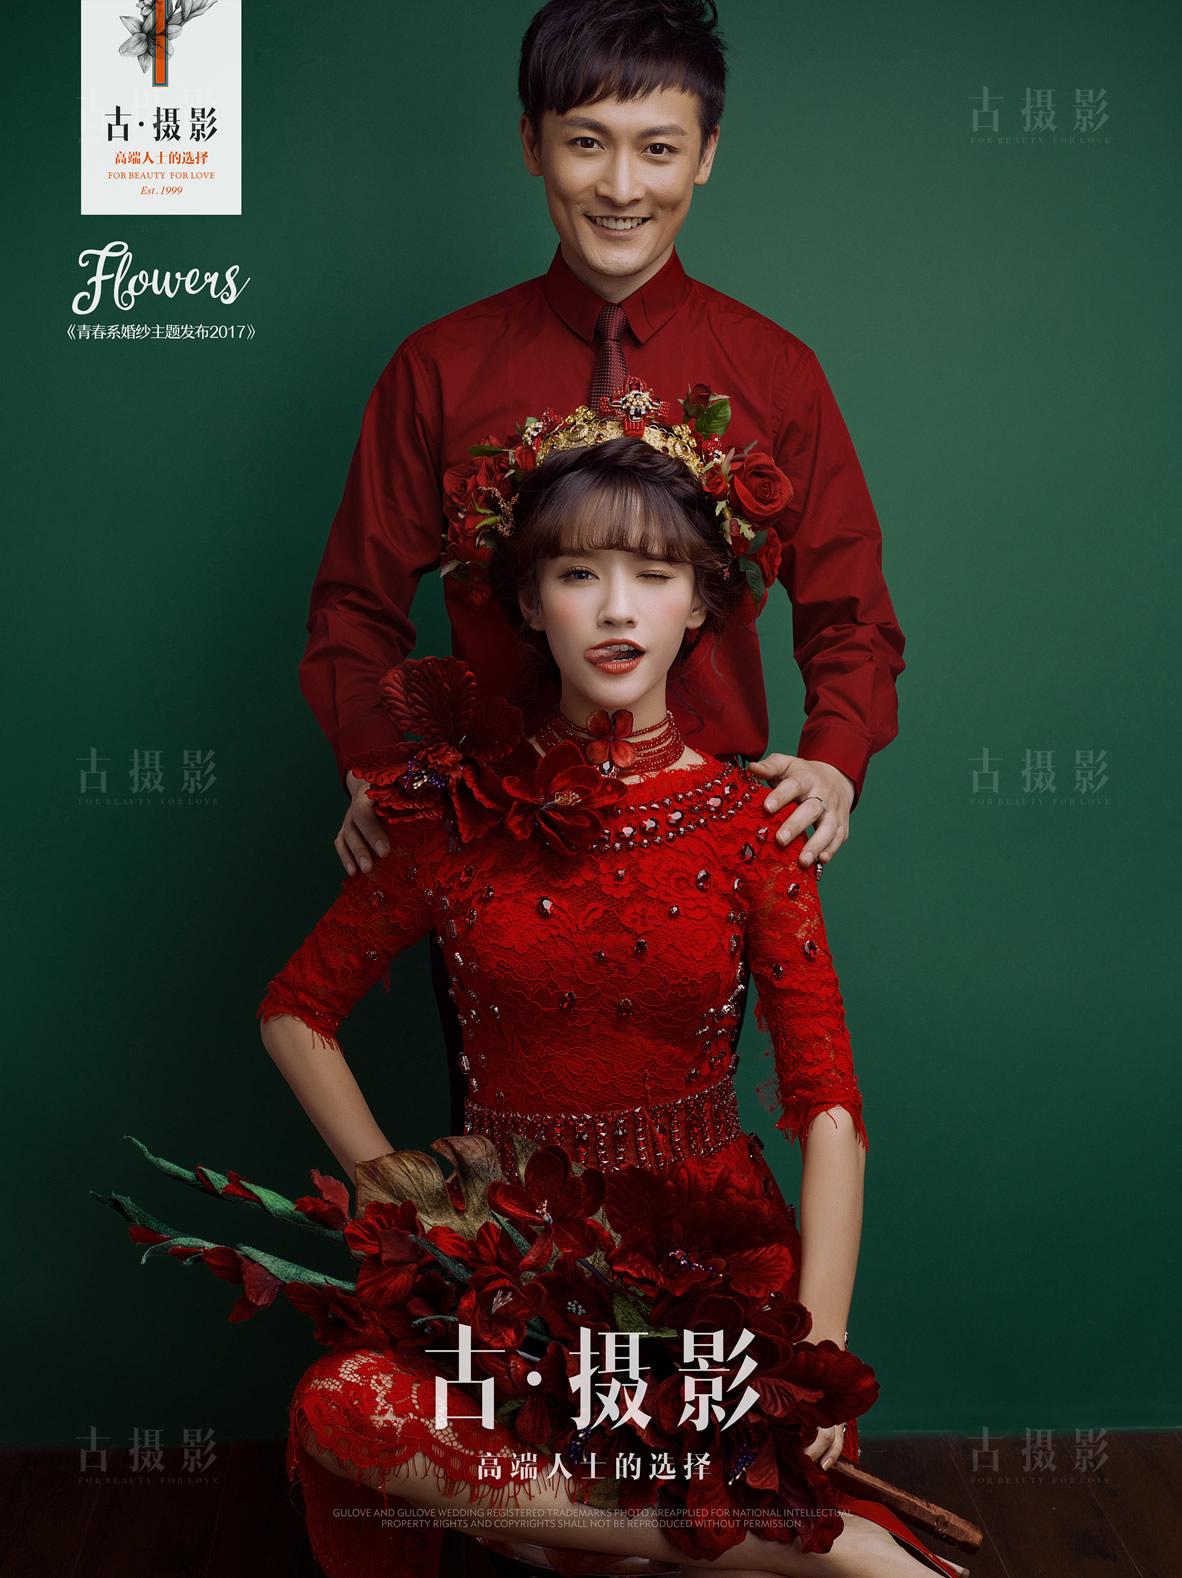 Flowers Red - 明星范 - 古摄影婚纱艺术-古摄影成都婚纱摄影艺术摄影网